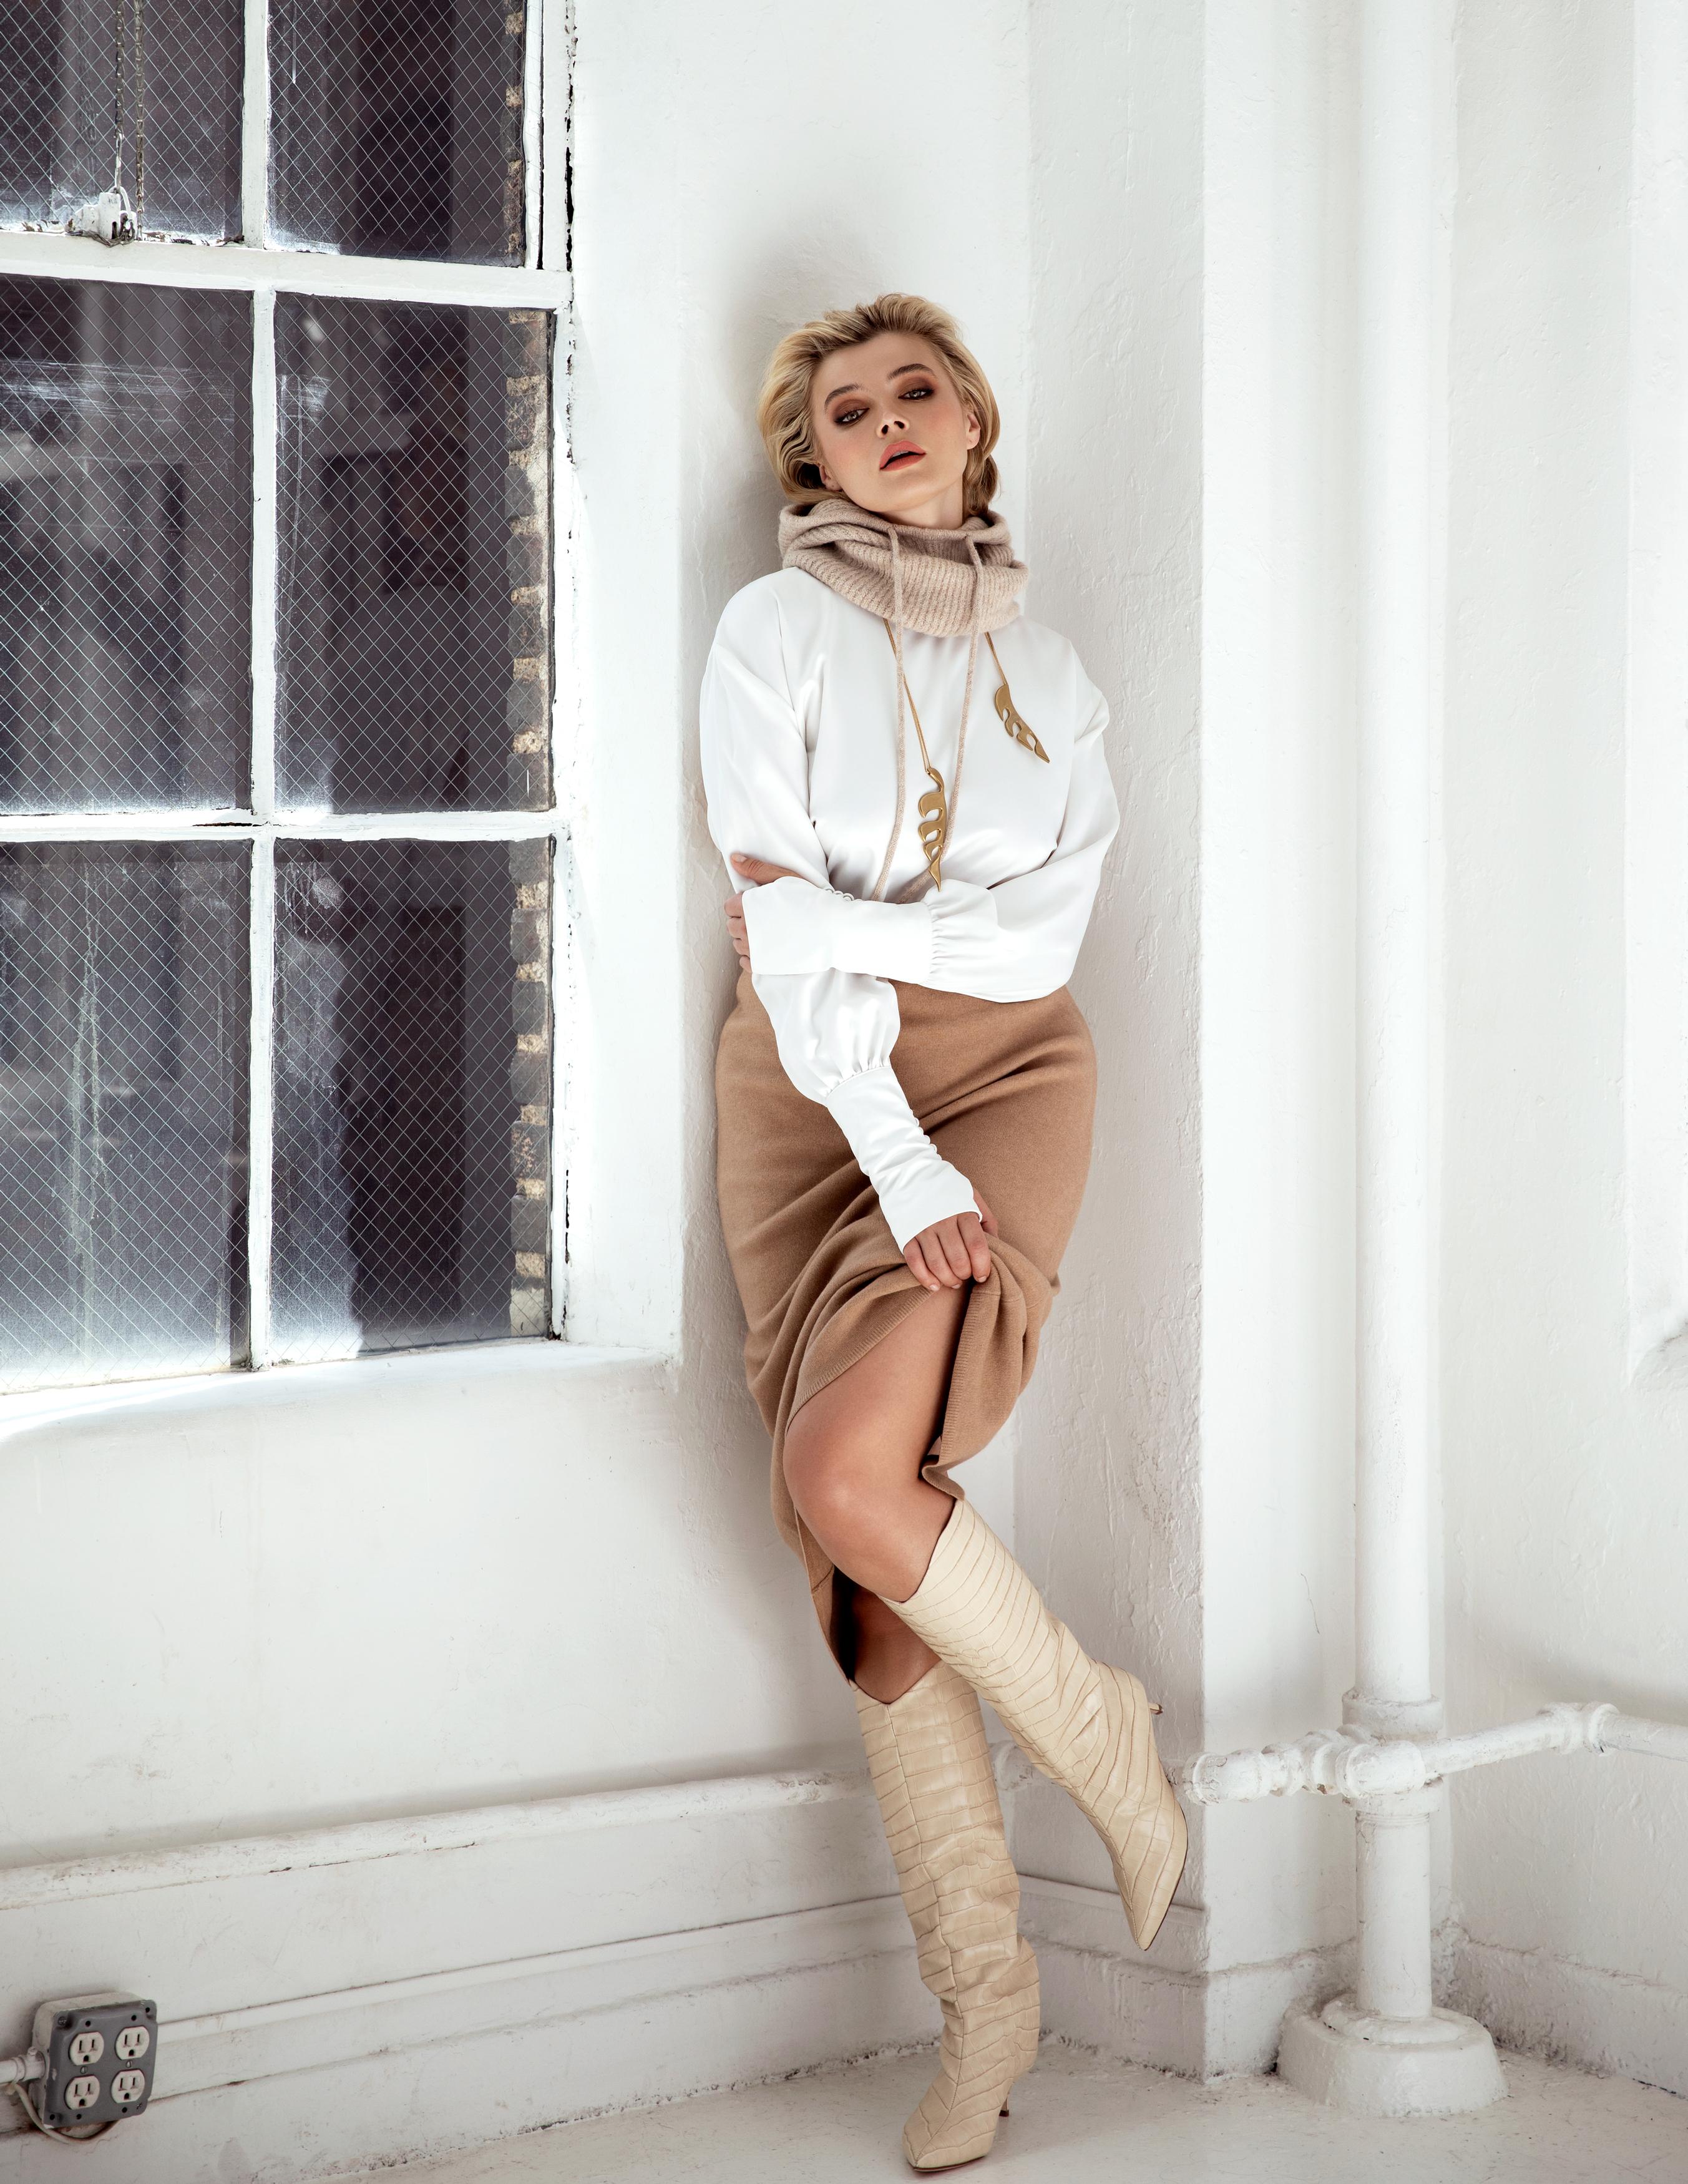 Khrystyana female model Glamour Hungary photoshoot for Bridge Models London